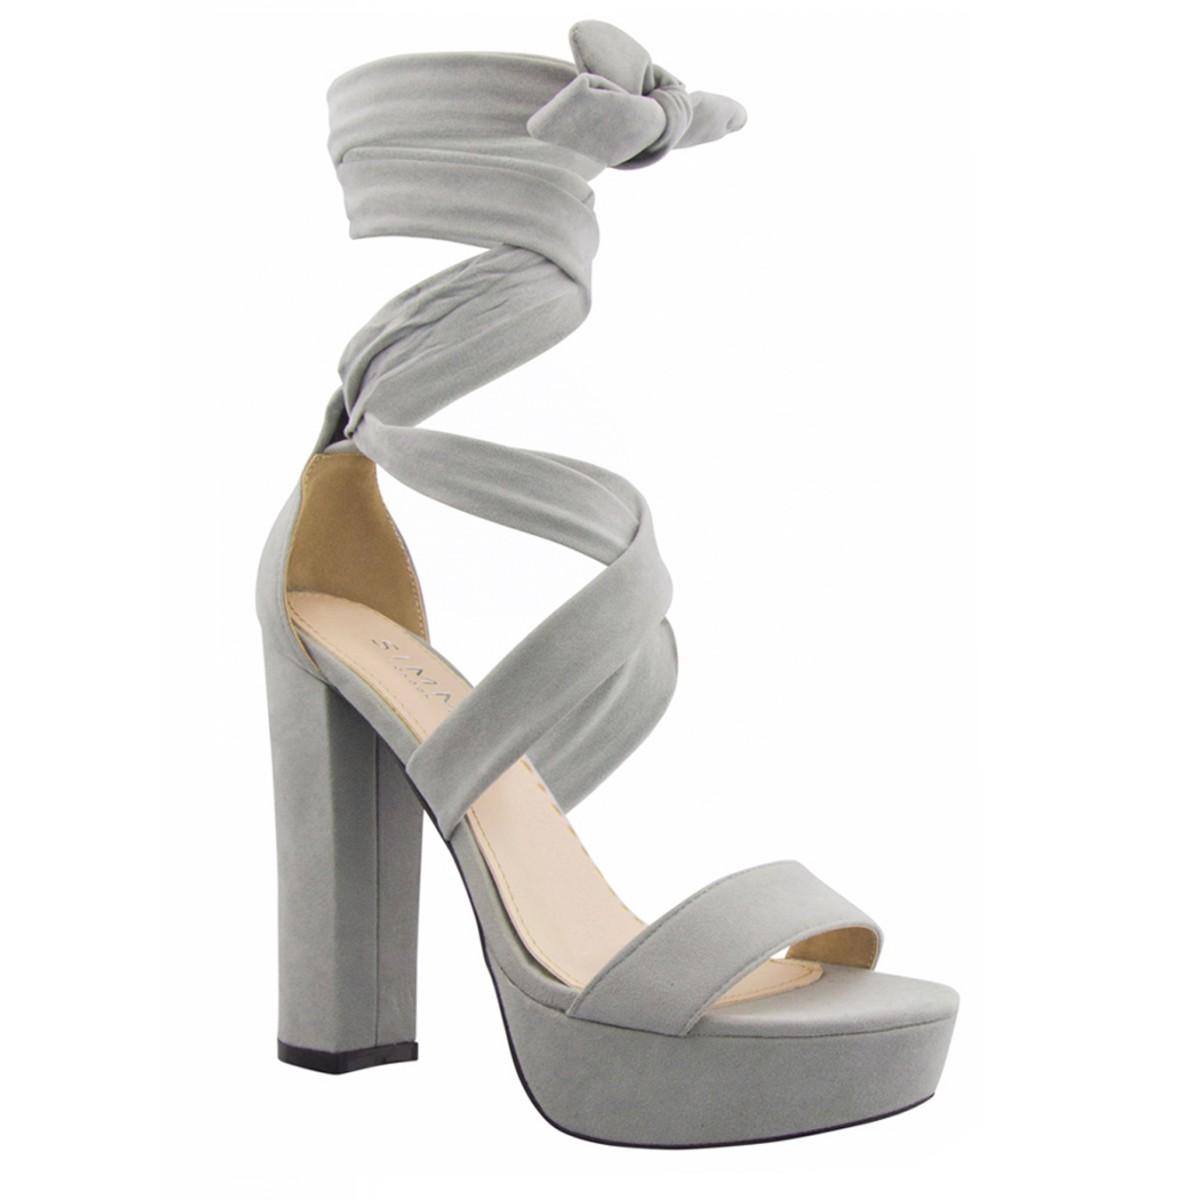 b6449fe40261 Grey Suede Lace Up Platform Heels   Simmi Shoes